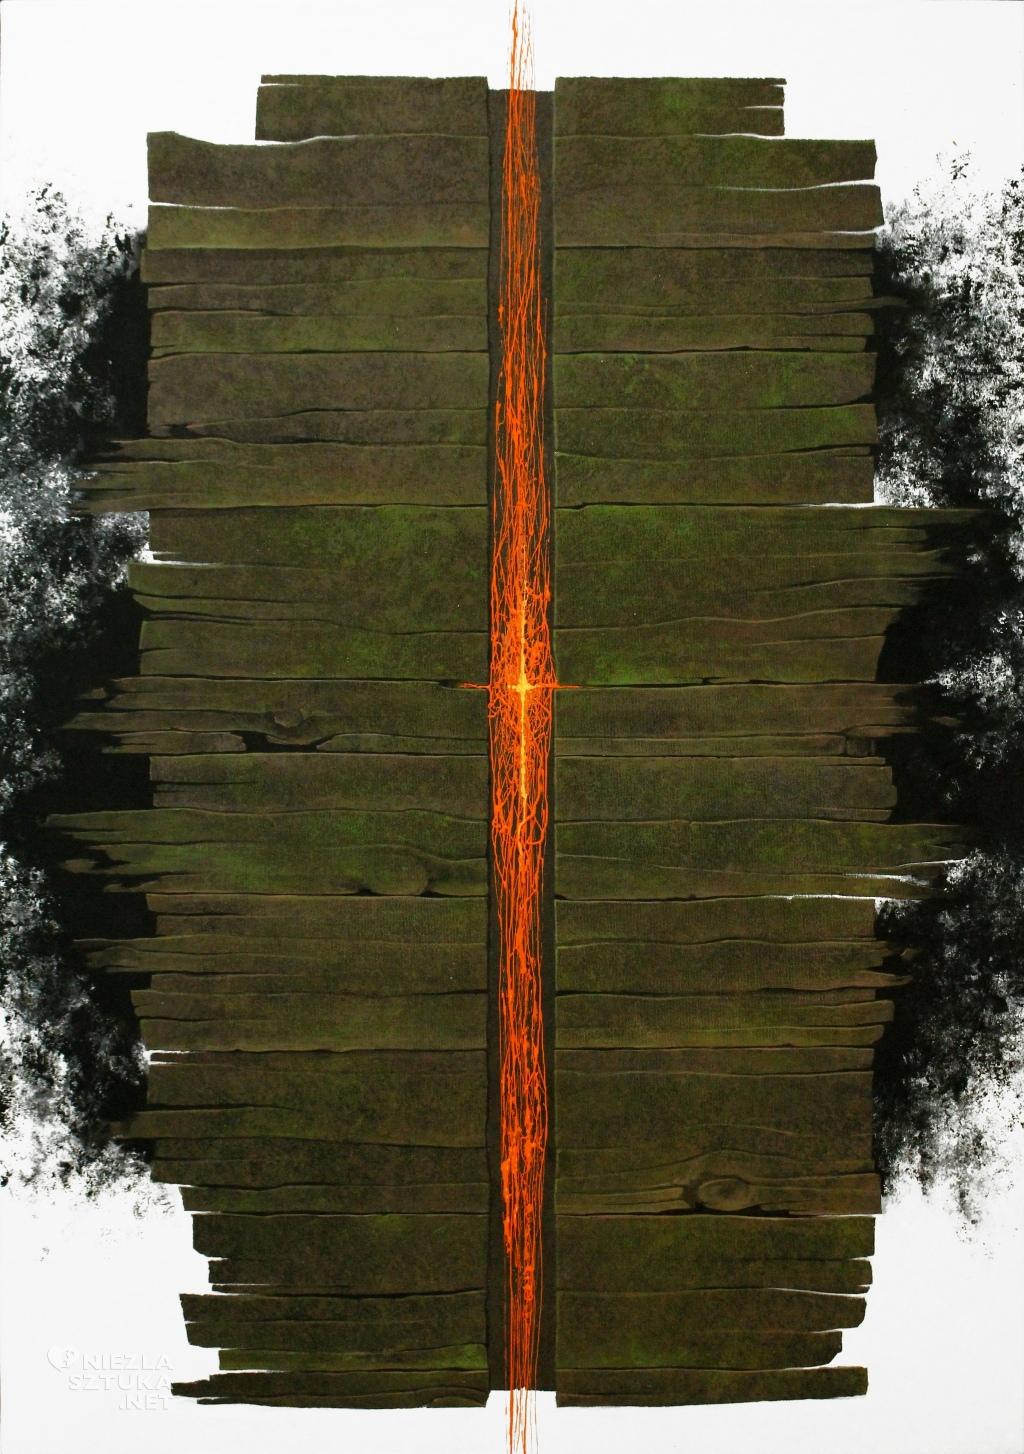 2016, 100x70cm, akryl na plotnie, Imp 4